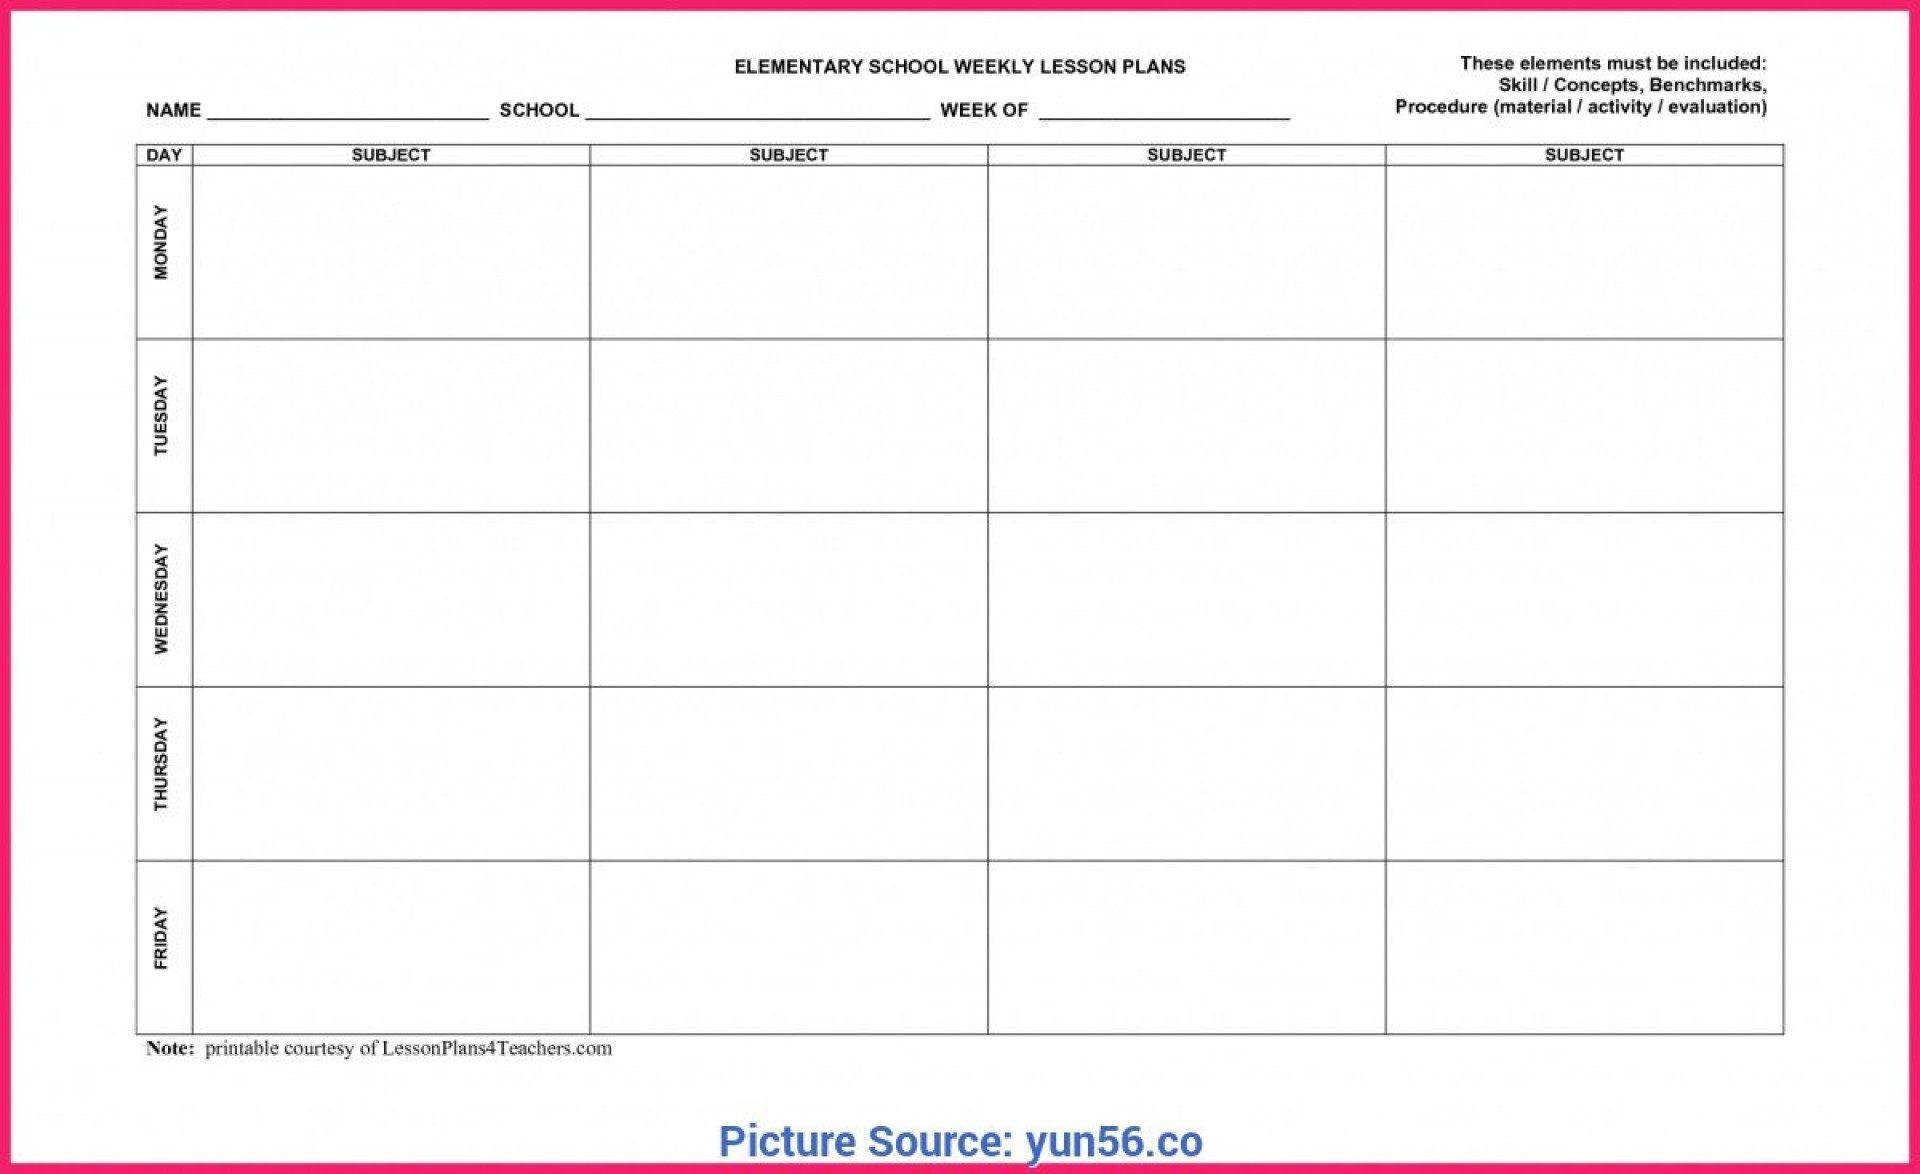 009 Frightening Weekly Lesson Plan Template Editable Idea  Google Doc Preschool Downloadable Free1920